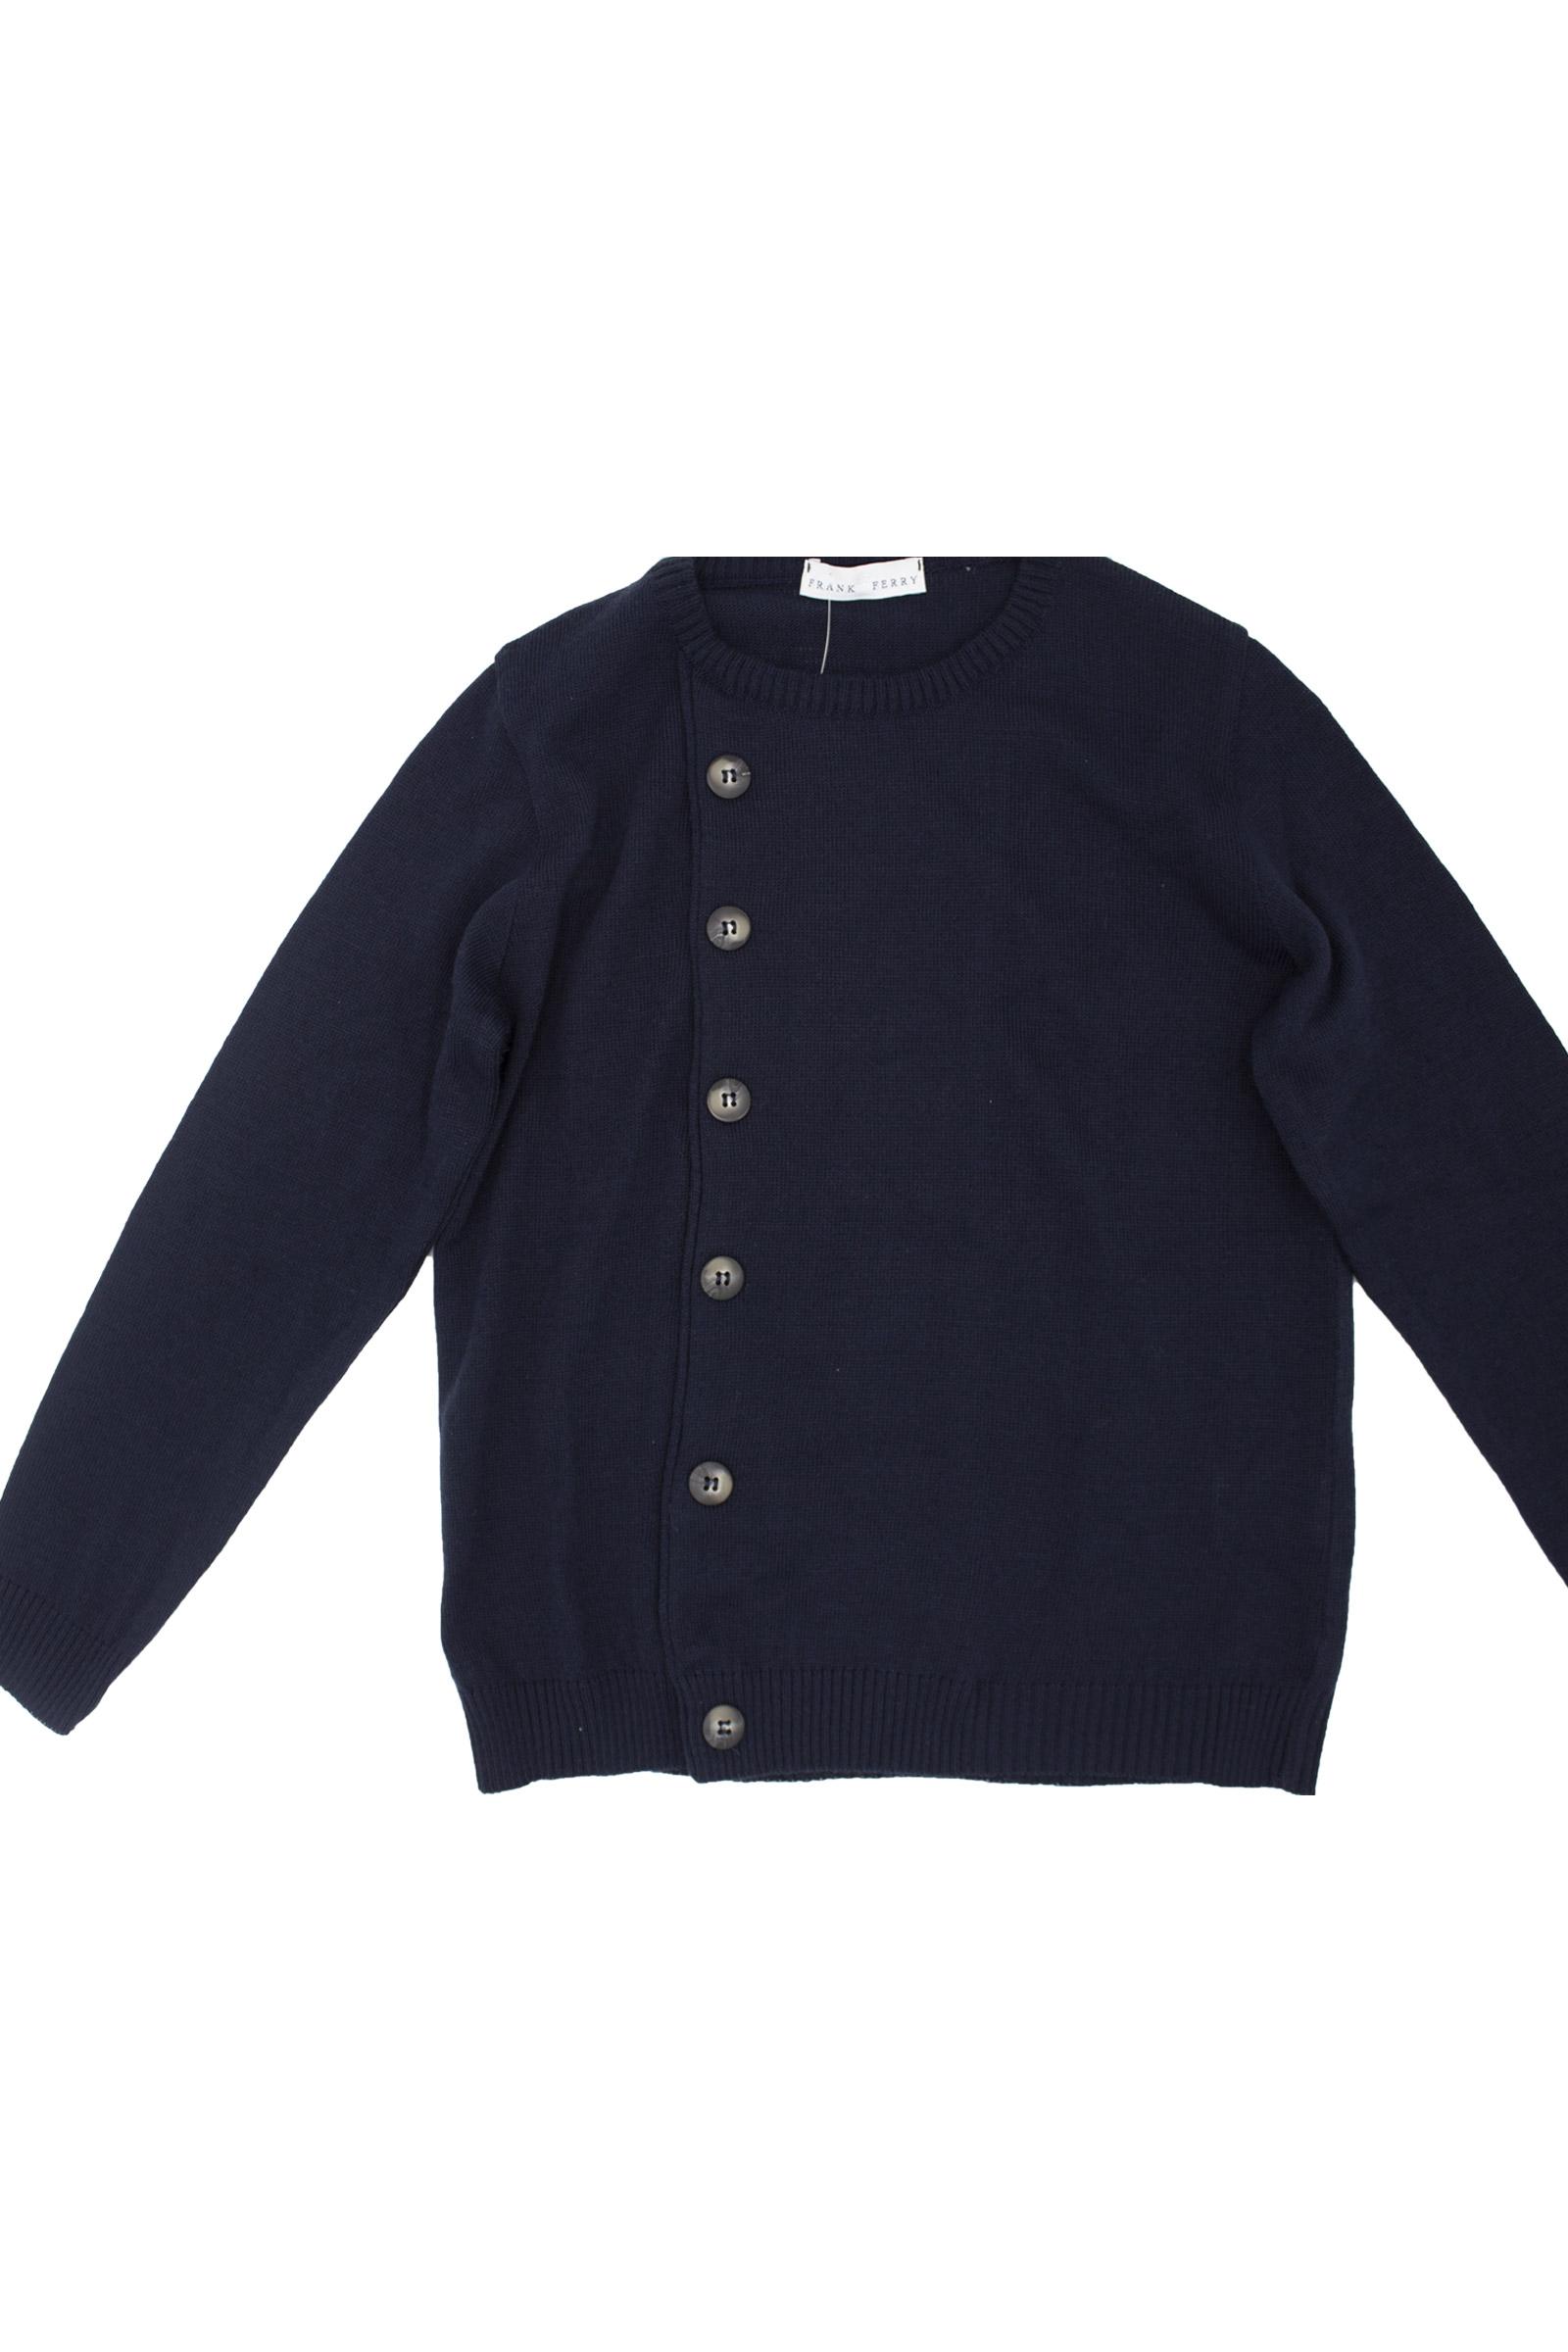 Frank Ferry pullover FRANK FERRY | Pullover | FF5258BLU